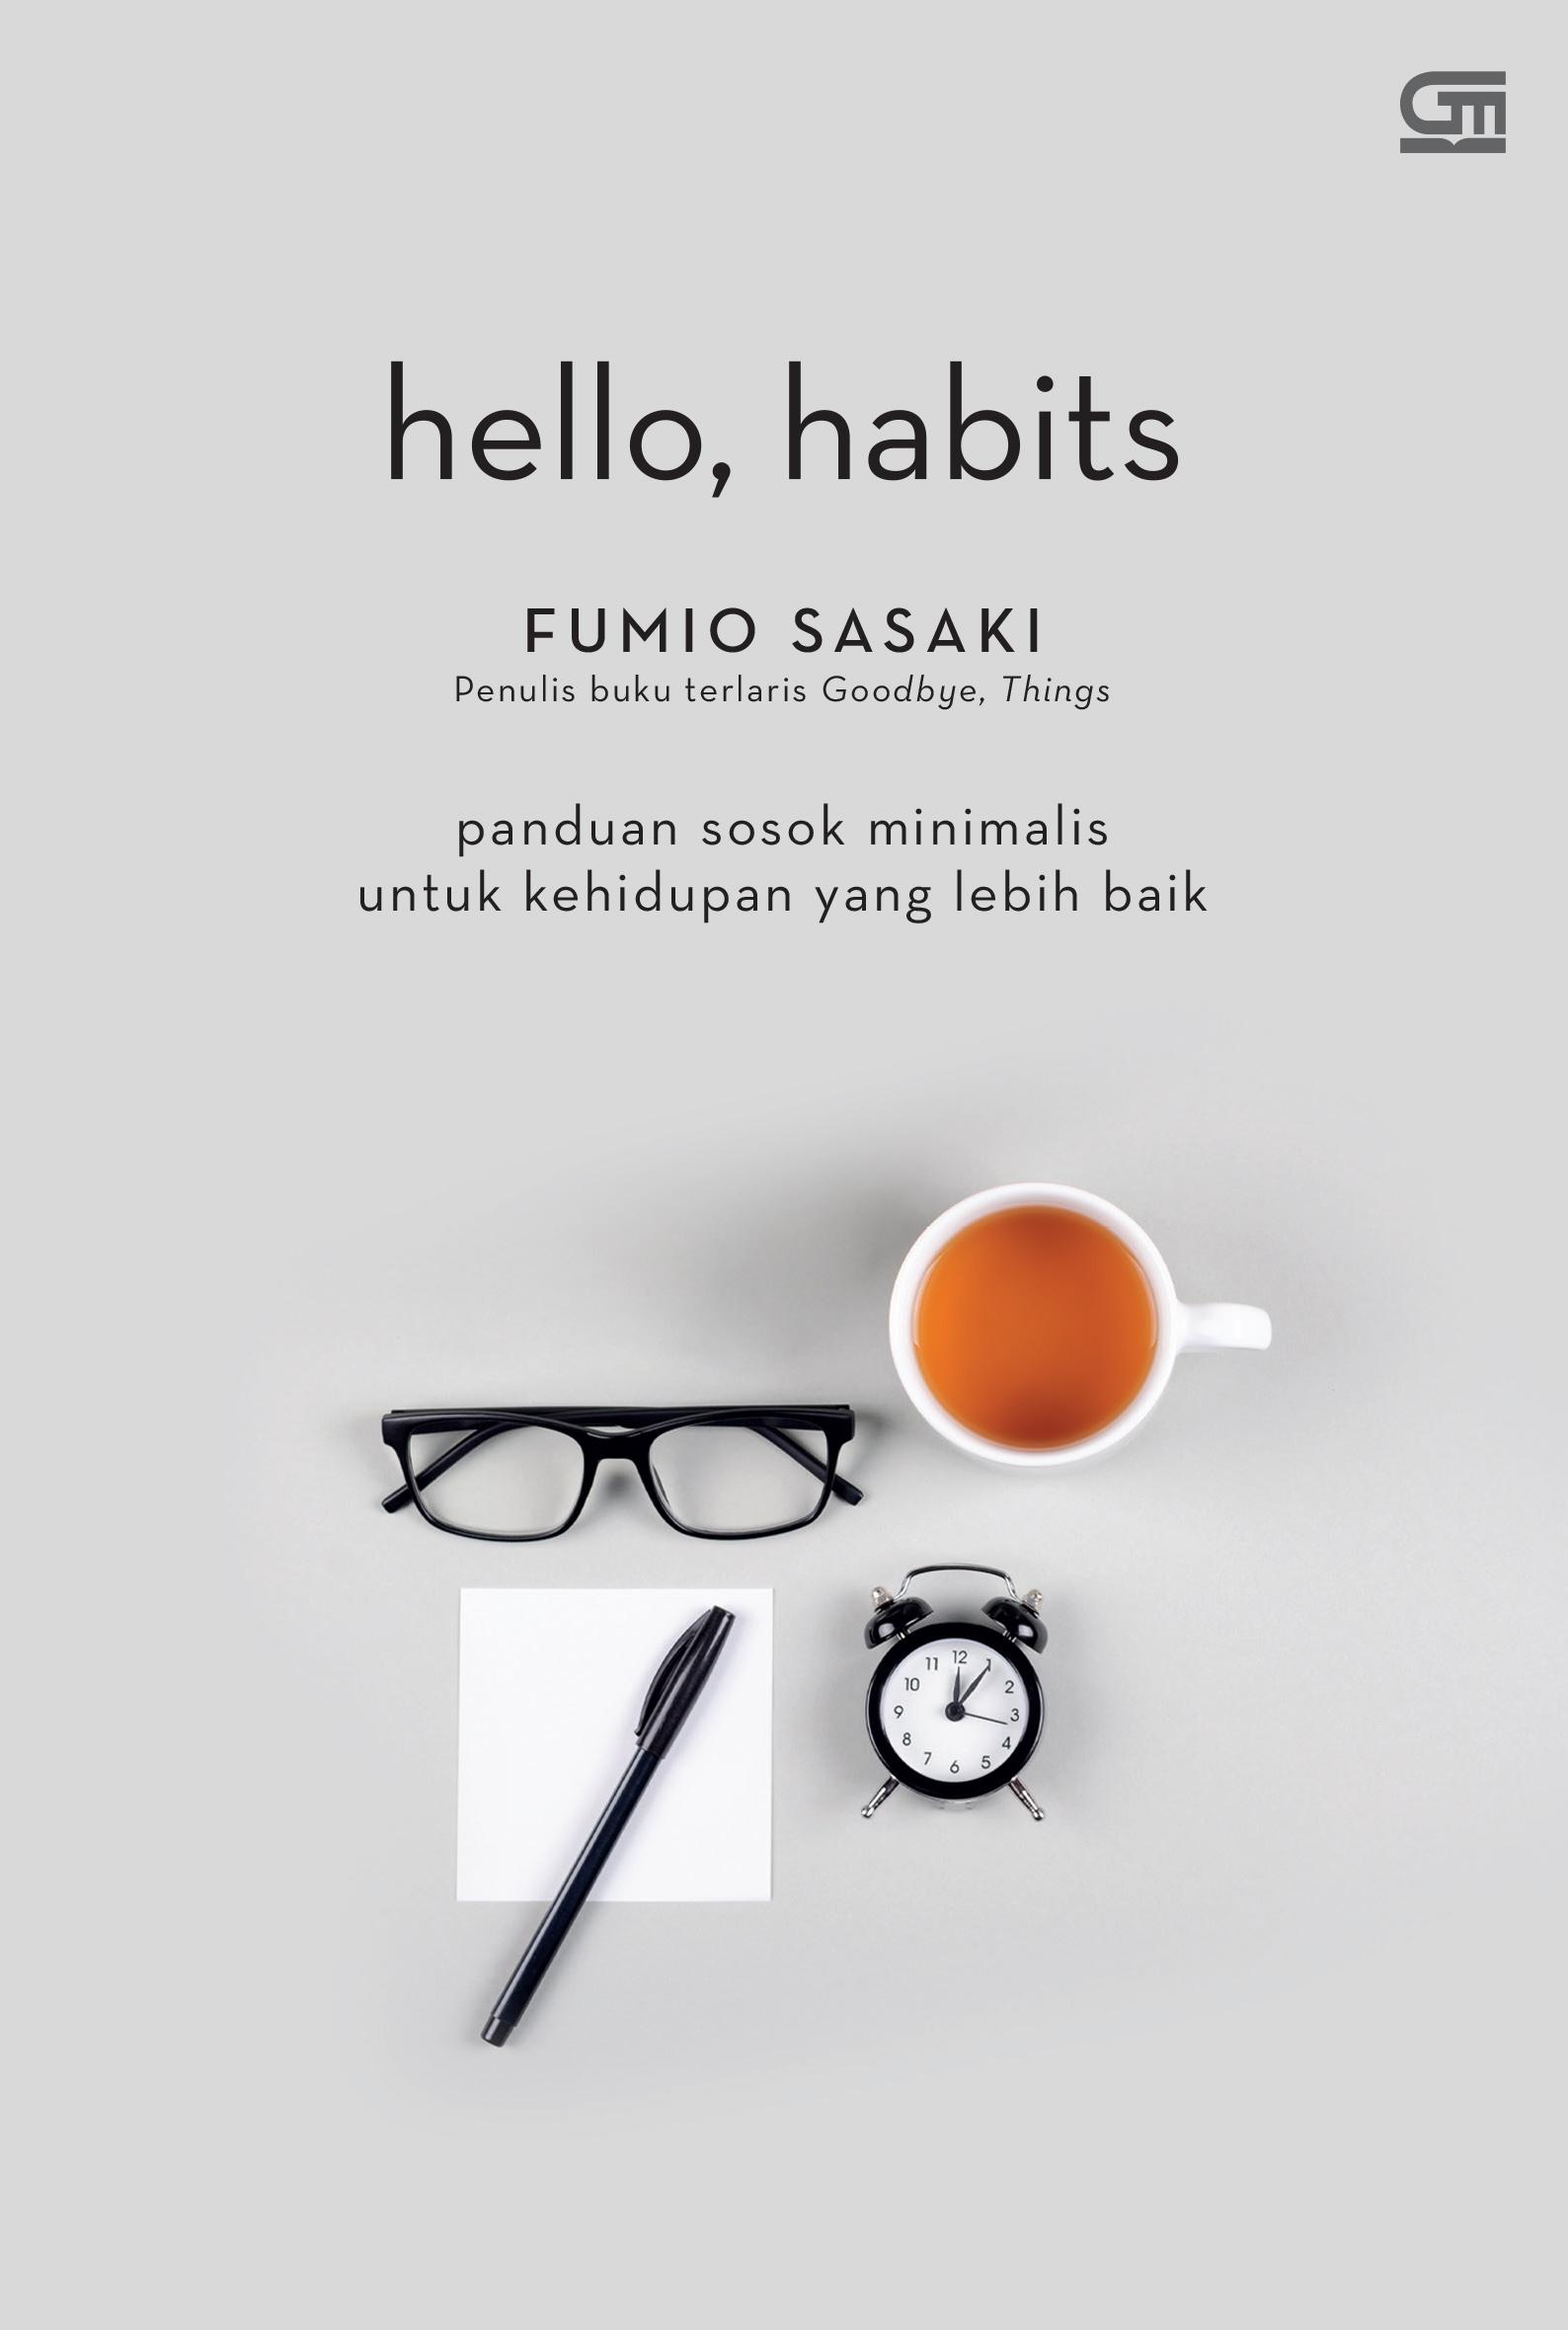 Hello Habits: Panduan Sosok Minimalis untuk Kehidupan yang Lebih Baik